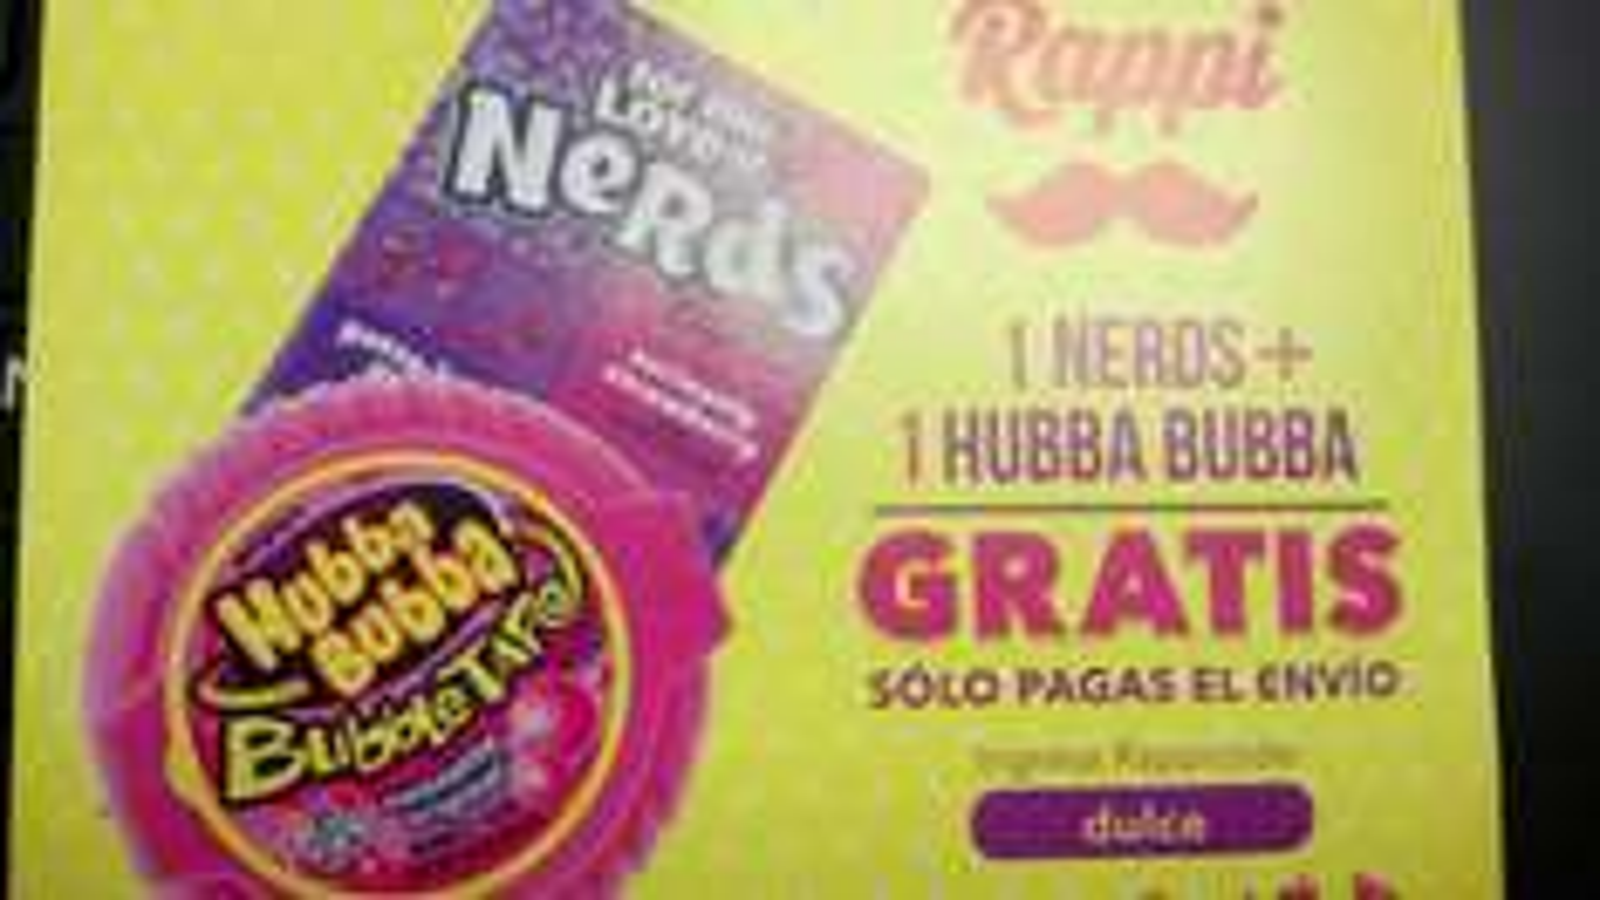 Rappi: 1 Nerds + 1 Hunna Bubba GRATIS